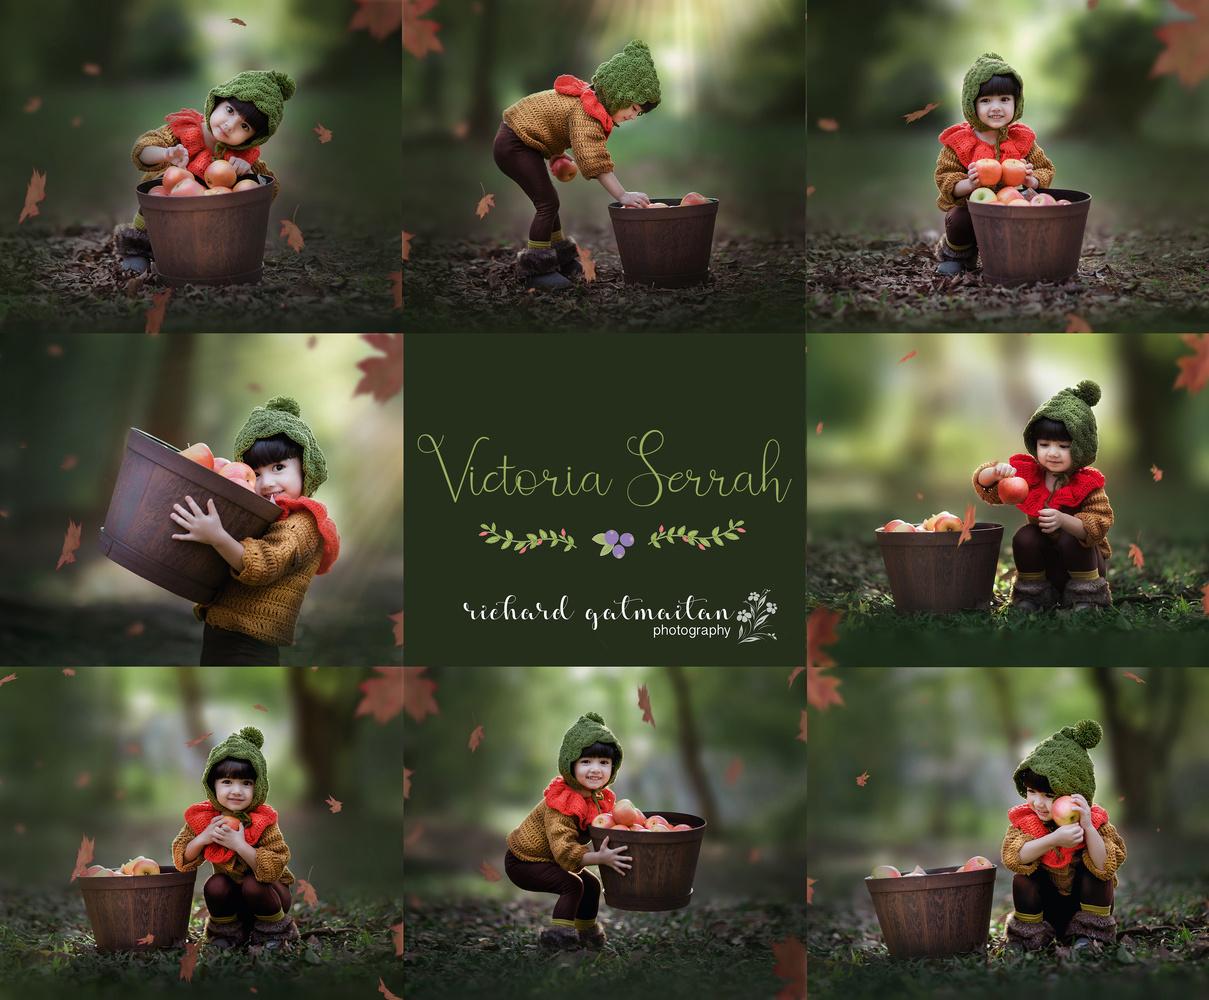 Victoria Serrah by Richard Gatmaitan